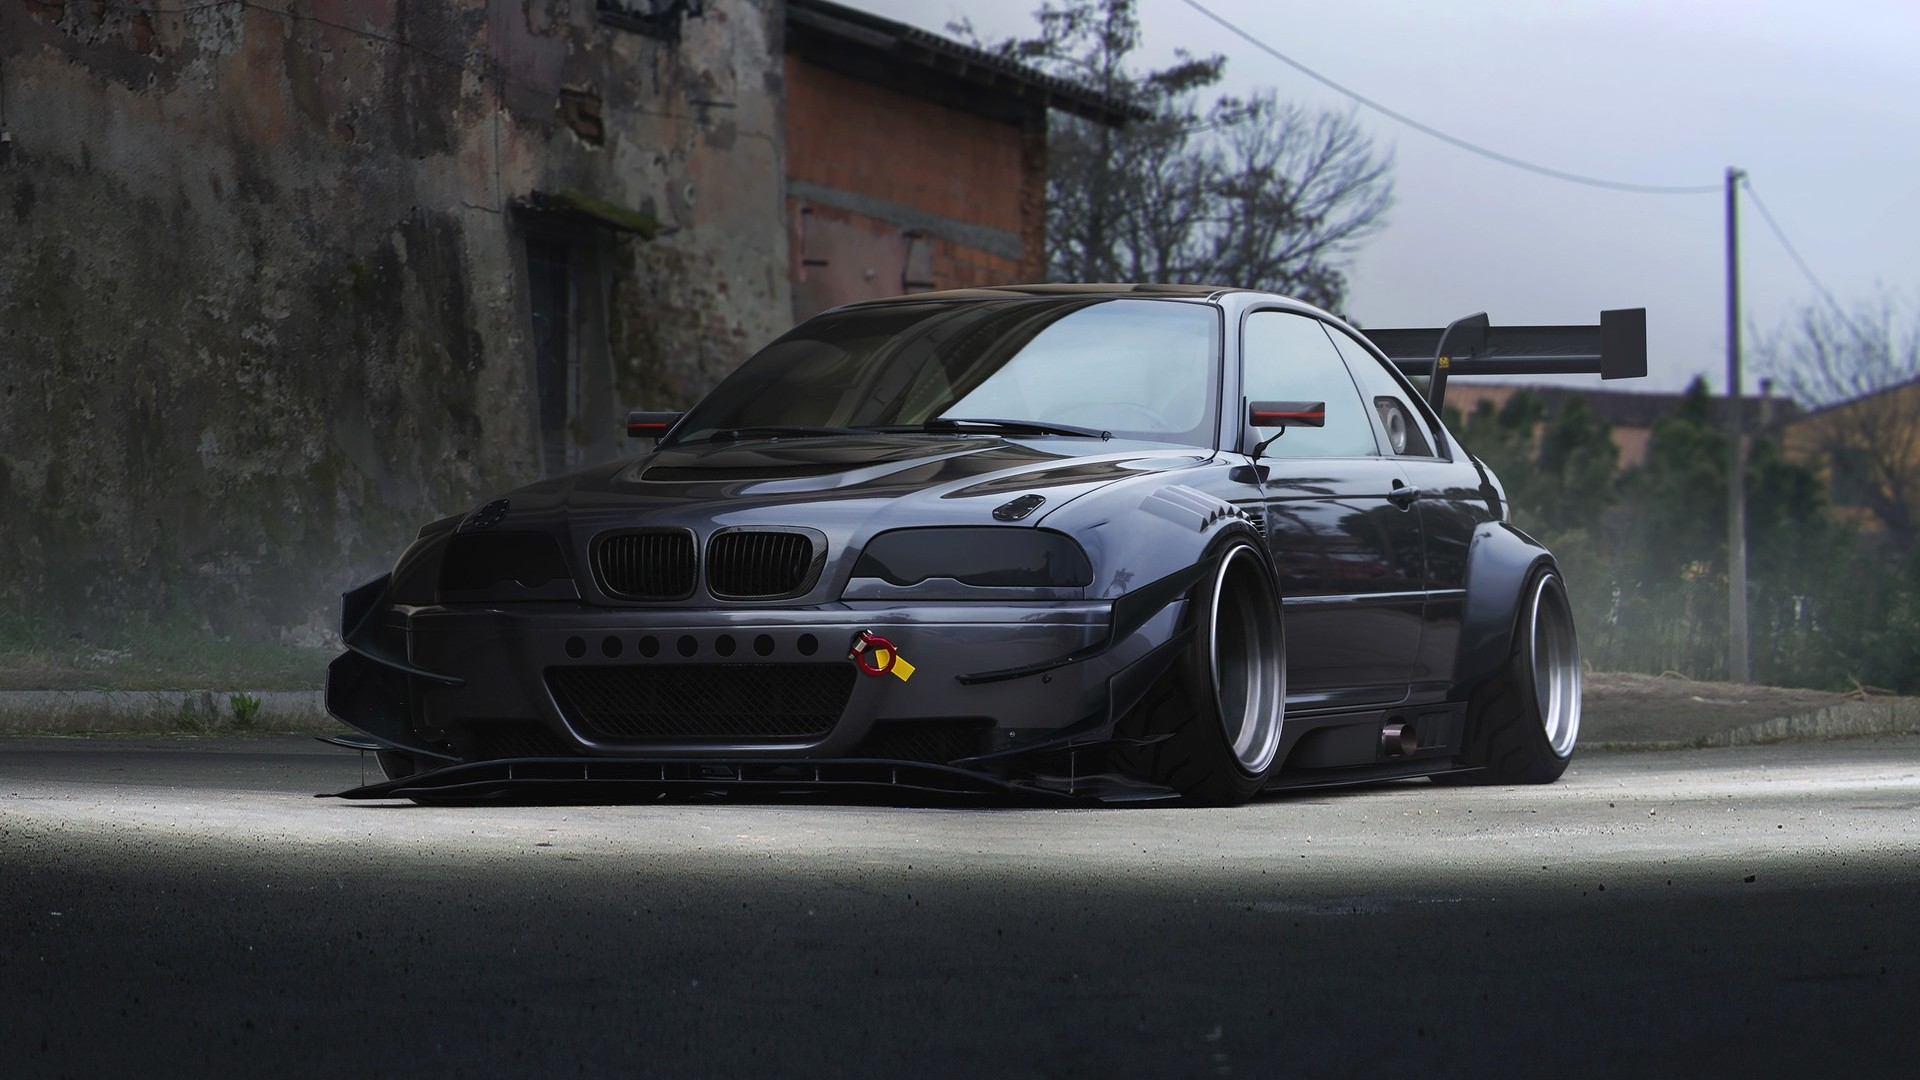 BMW M3 E46 Wallpaper 69 images 1920x1080